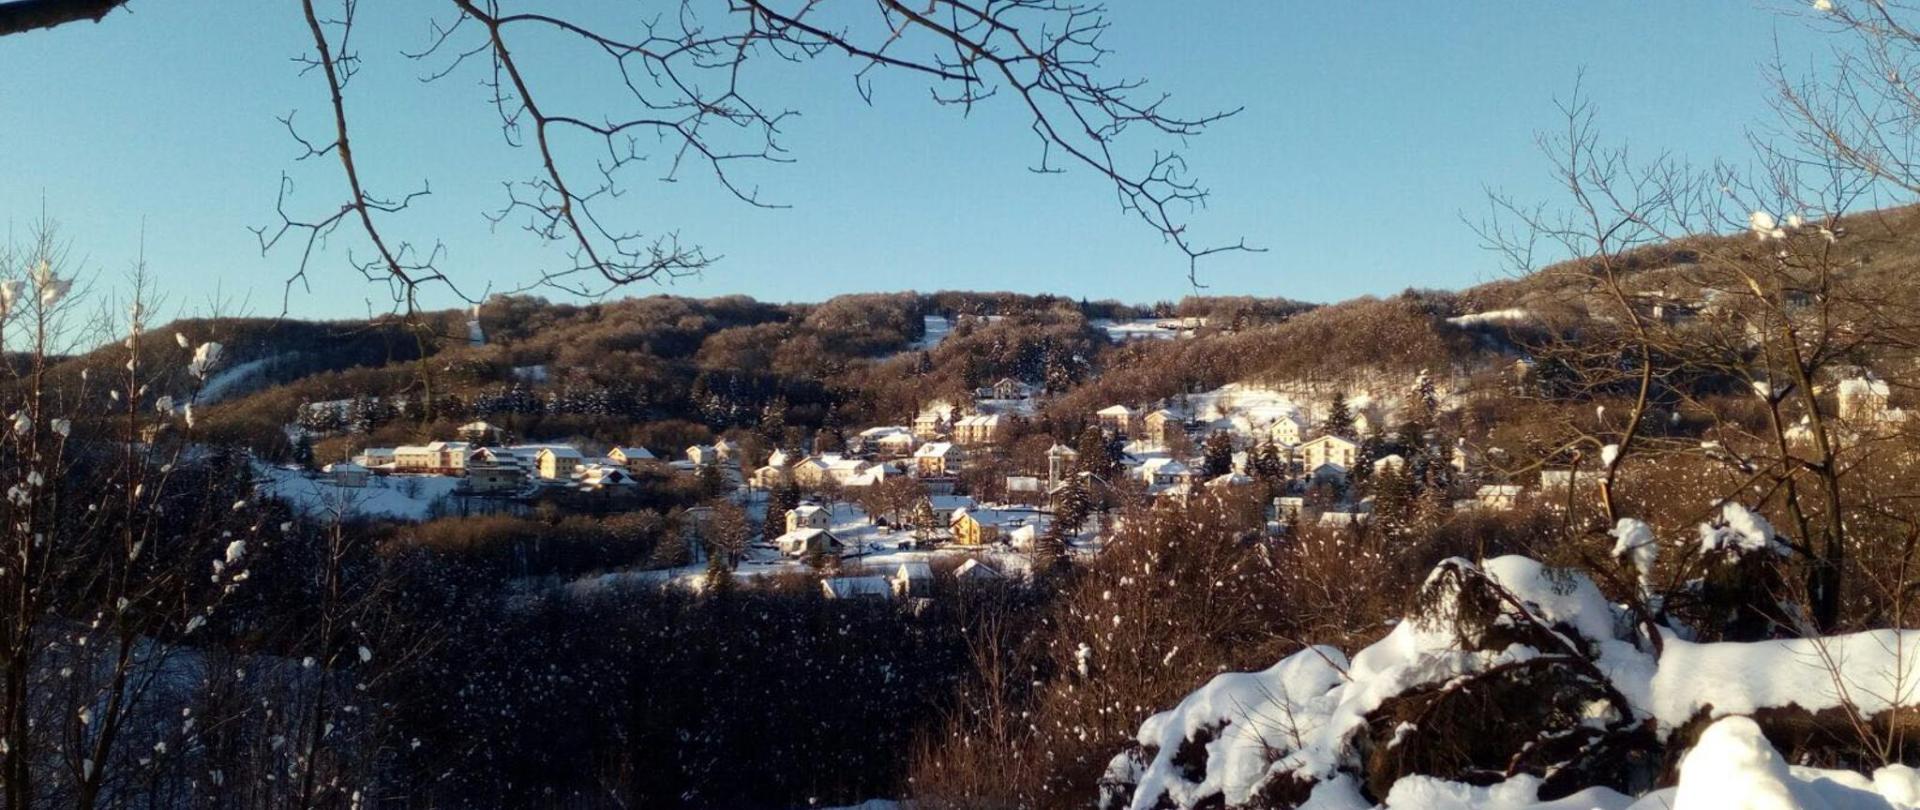 2018-02-07-LCI winter 03.jpg